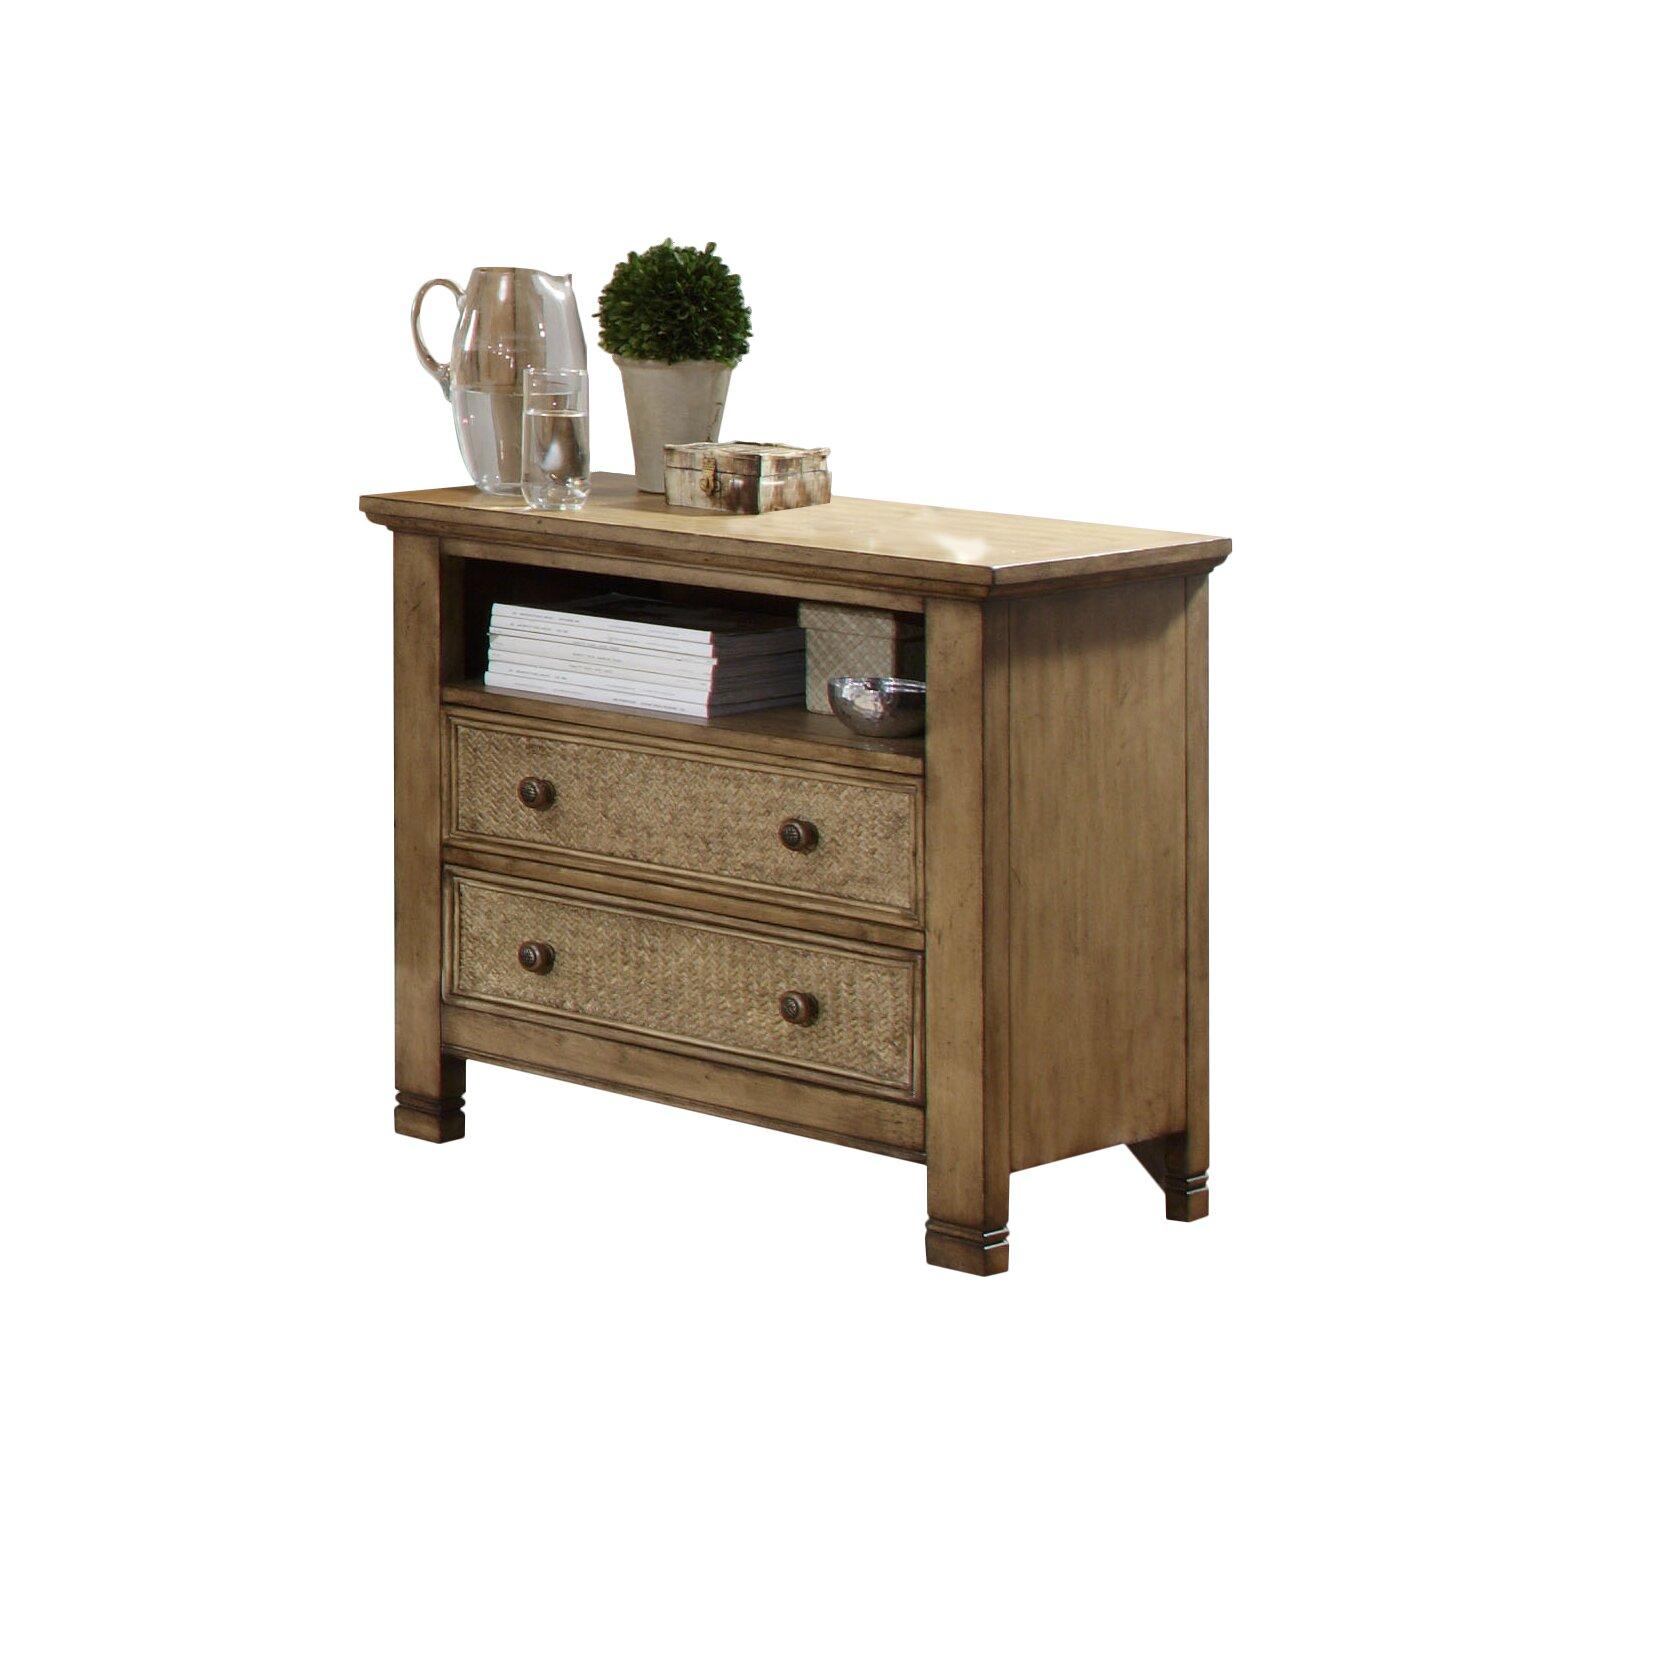 Progressive furniture kingston isle 2 drawer bachelor 39 s for Furniture kingston